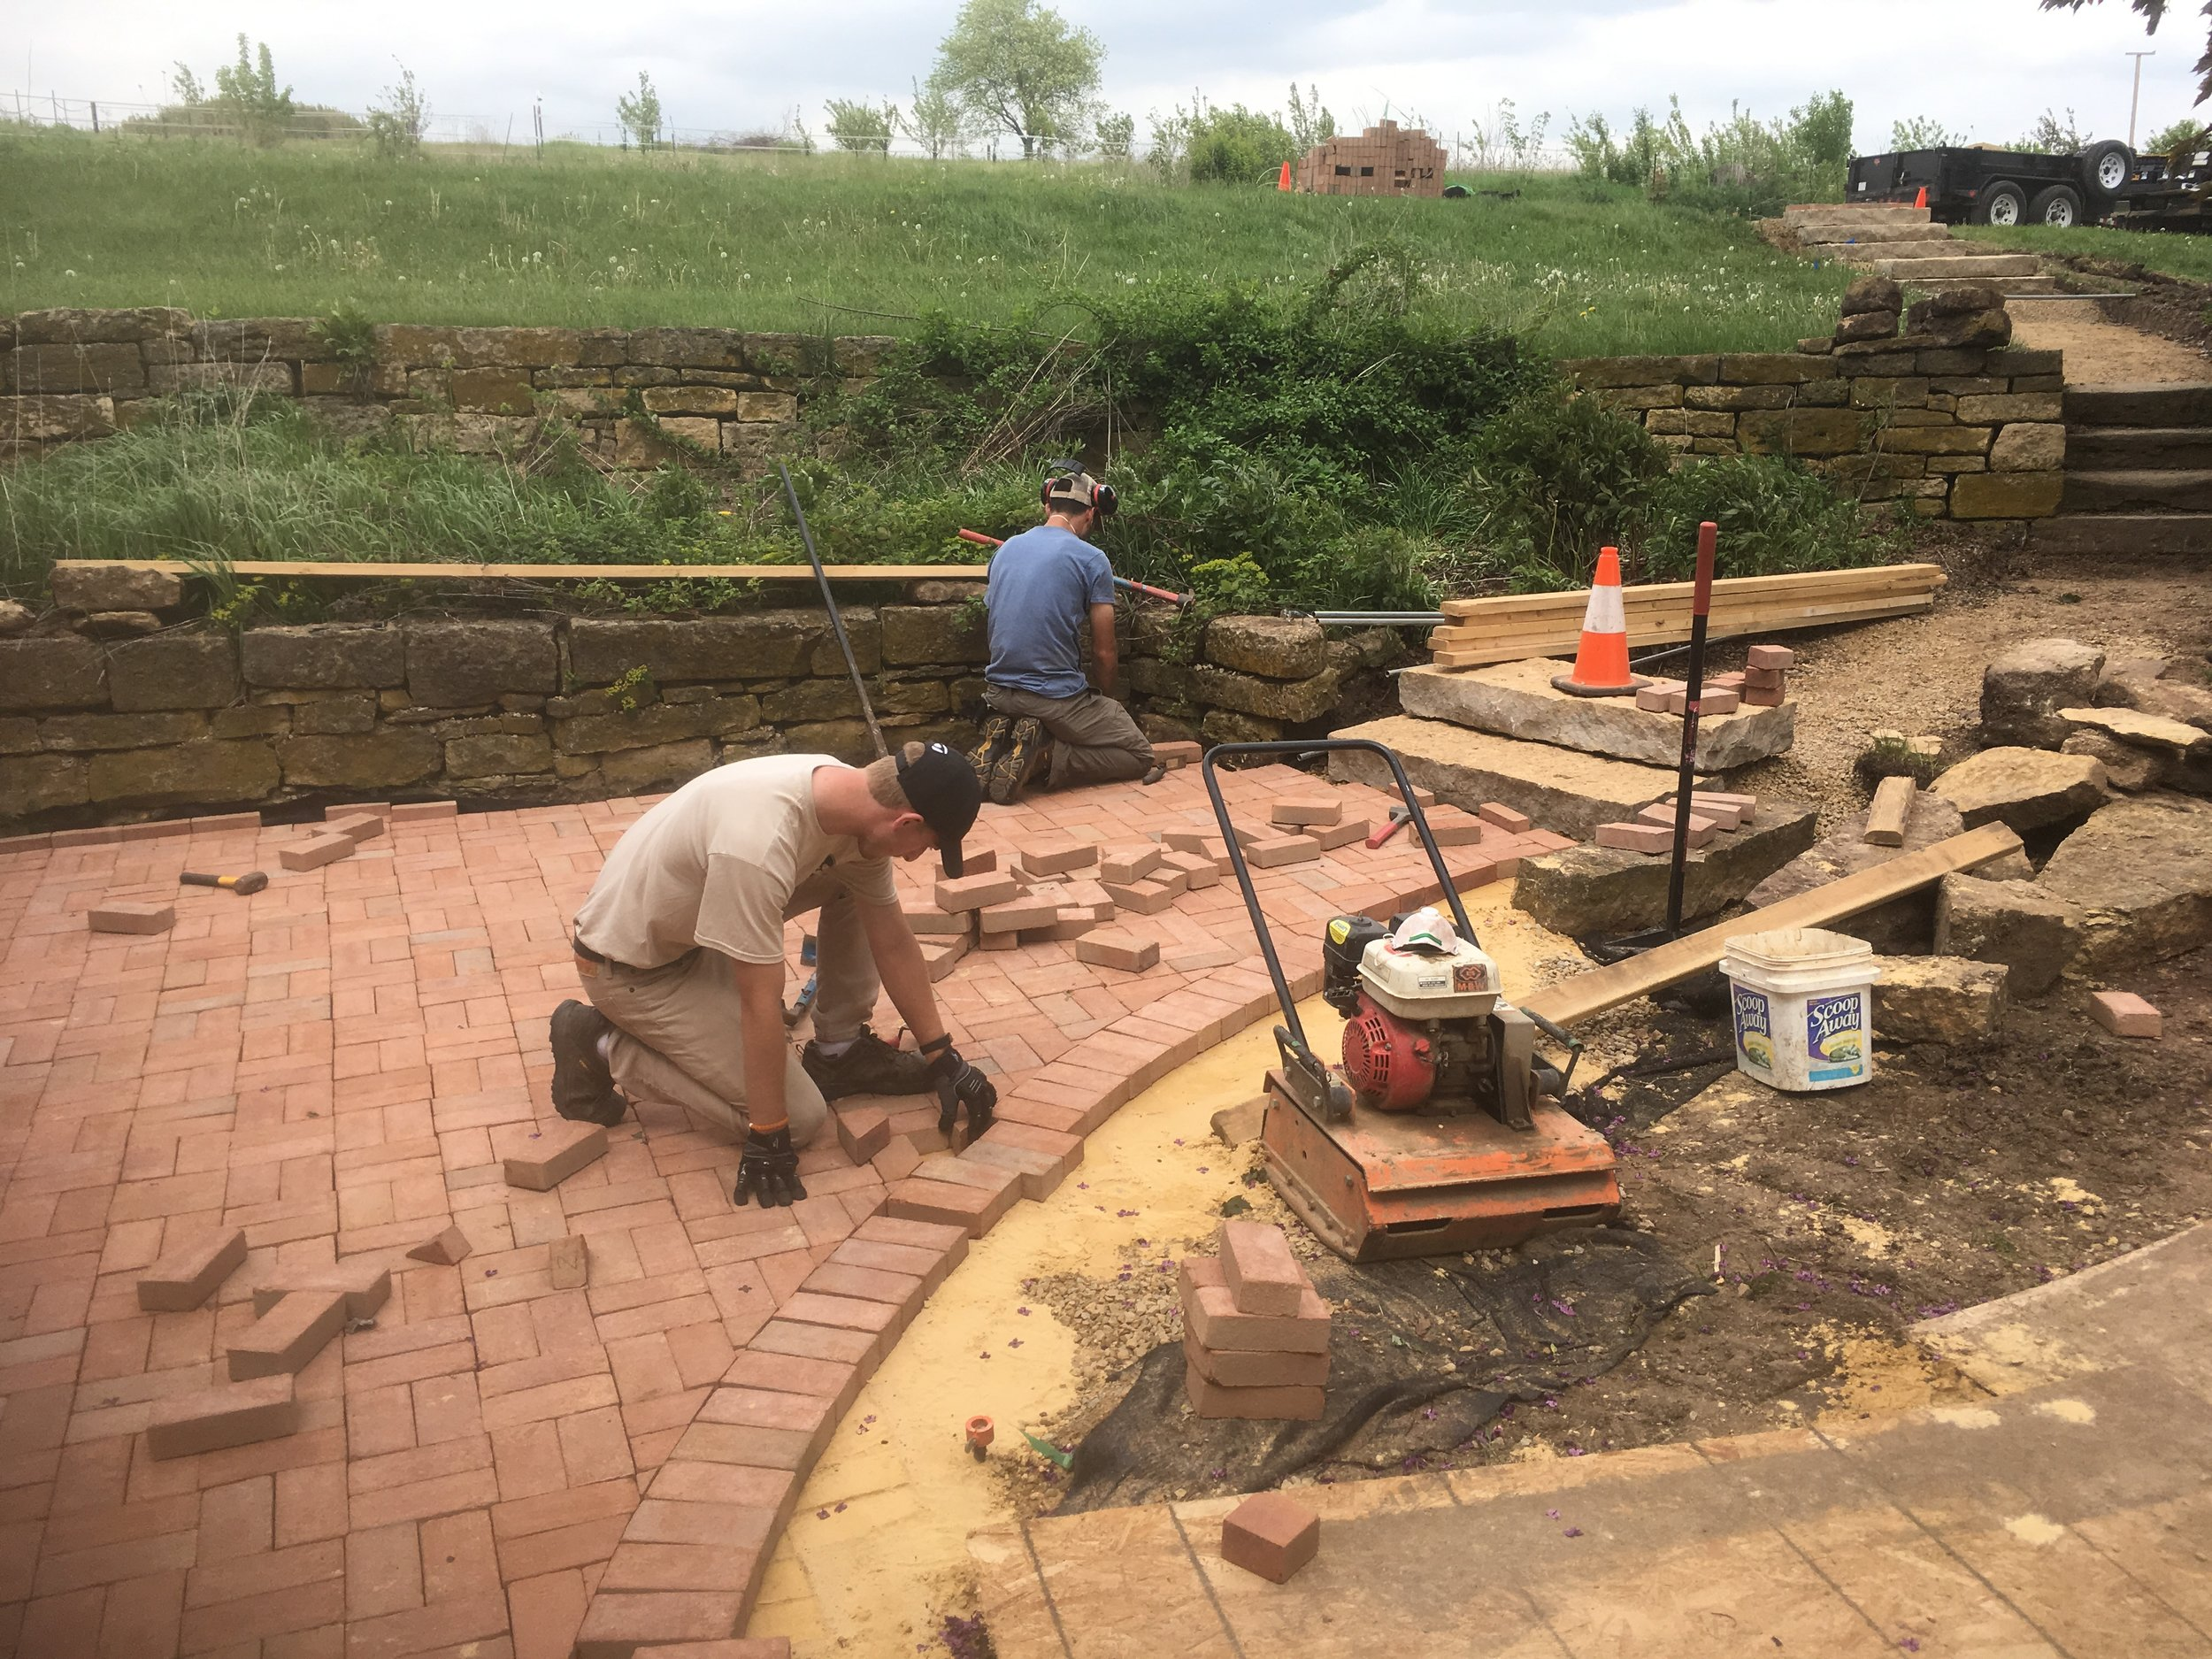 Brick Patio Detailing - Edge Refinement